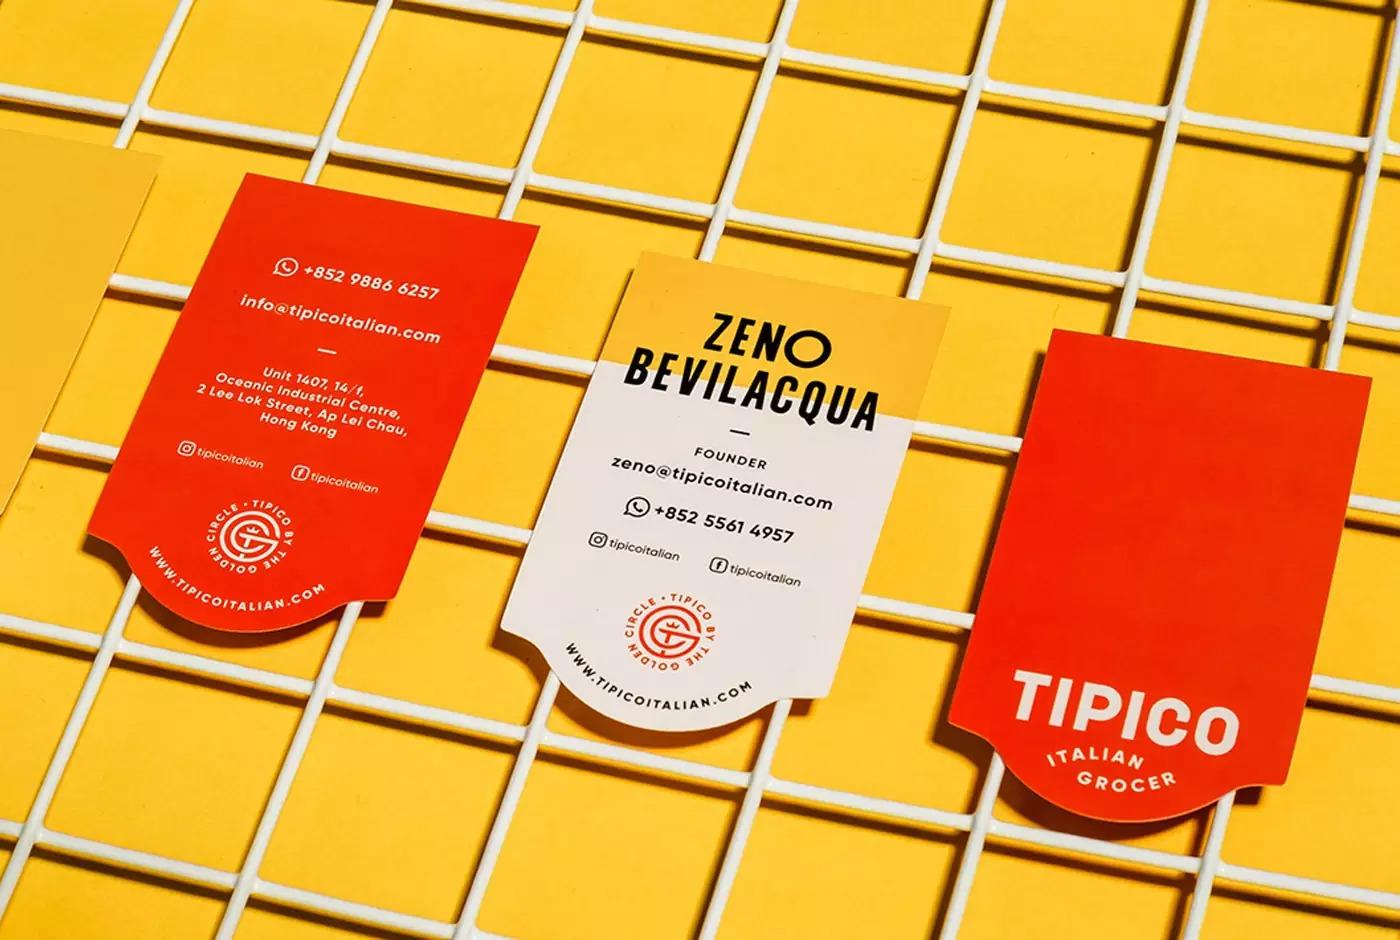 Tipico便利店品牌VI设计